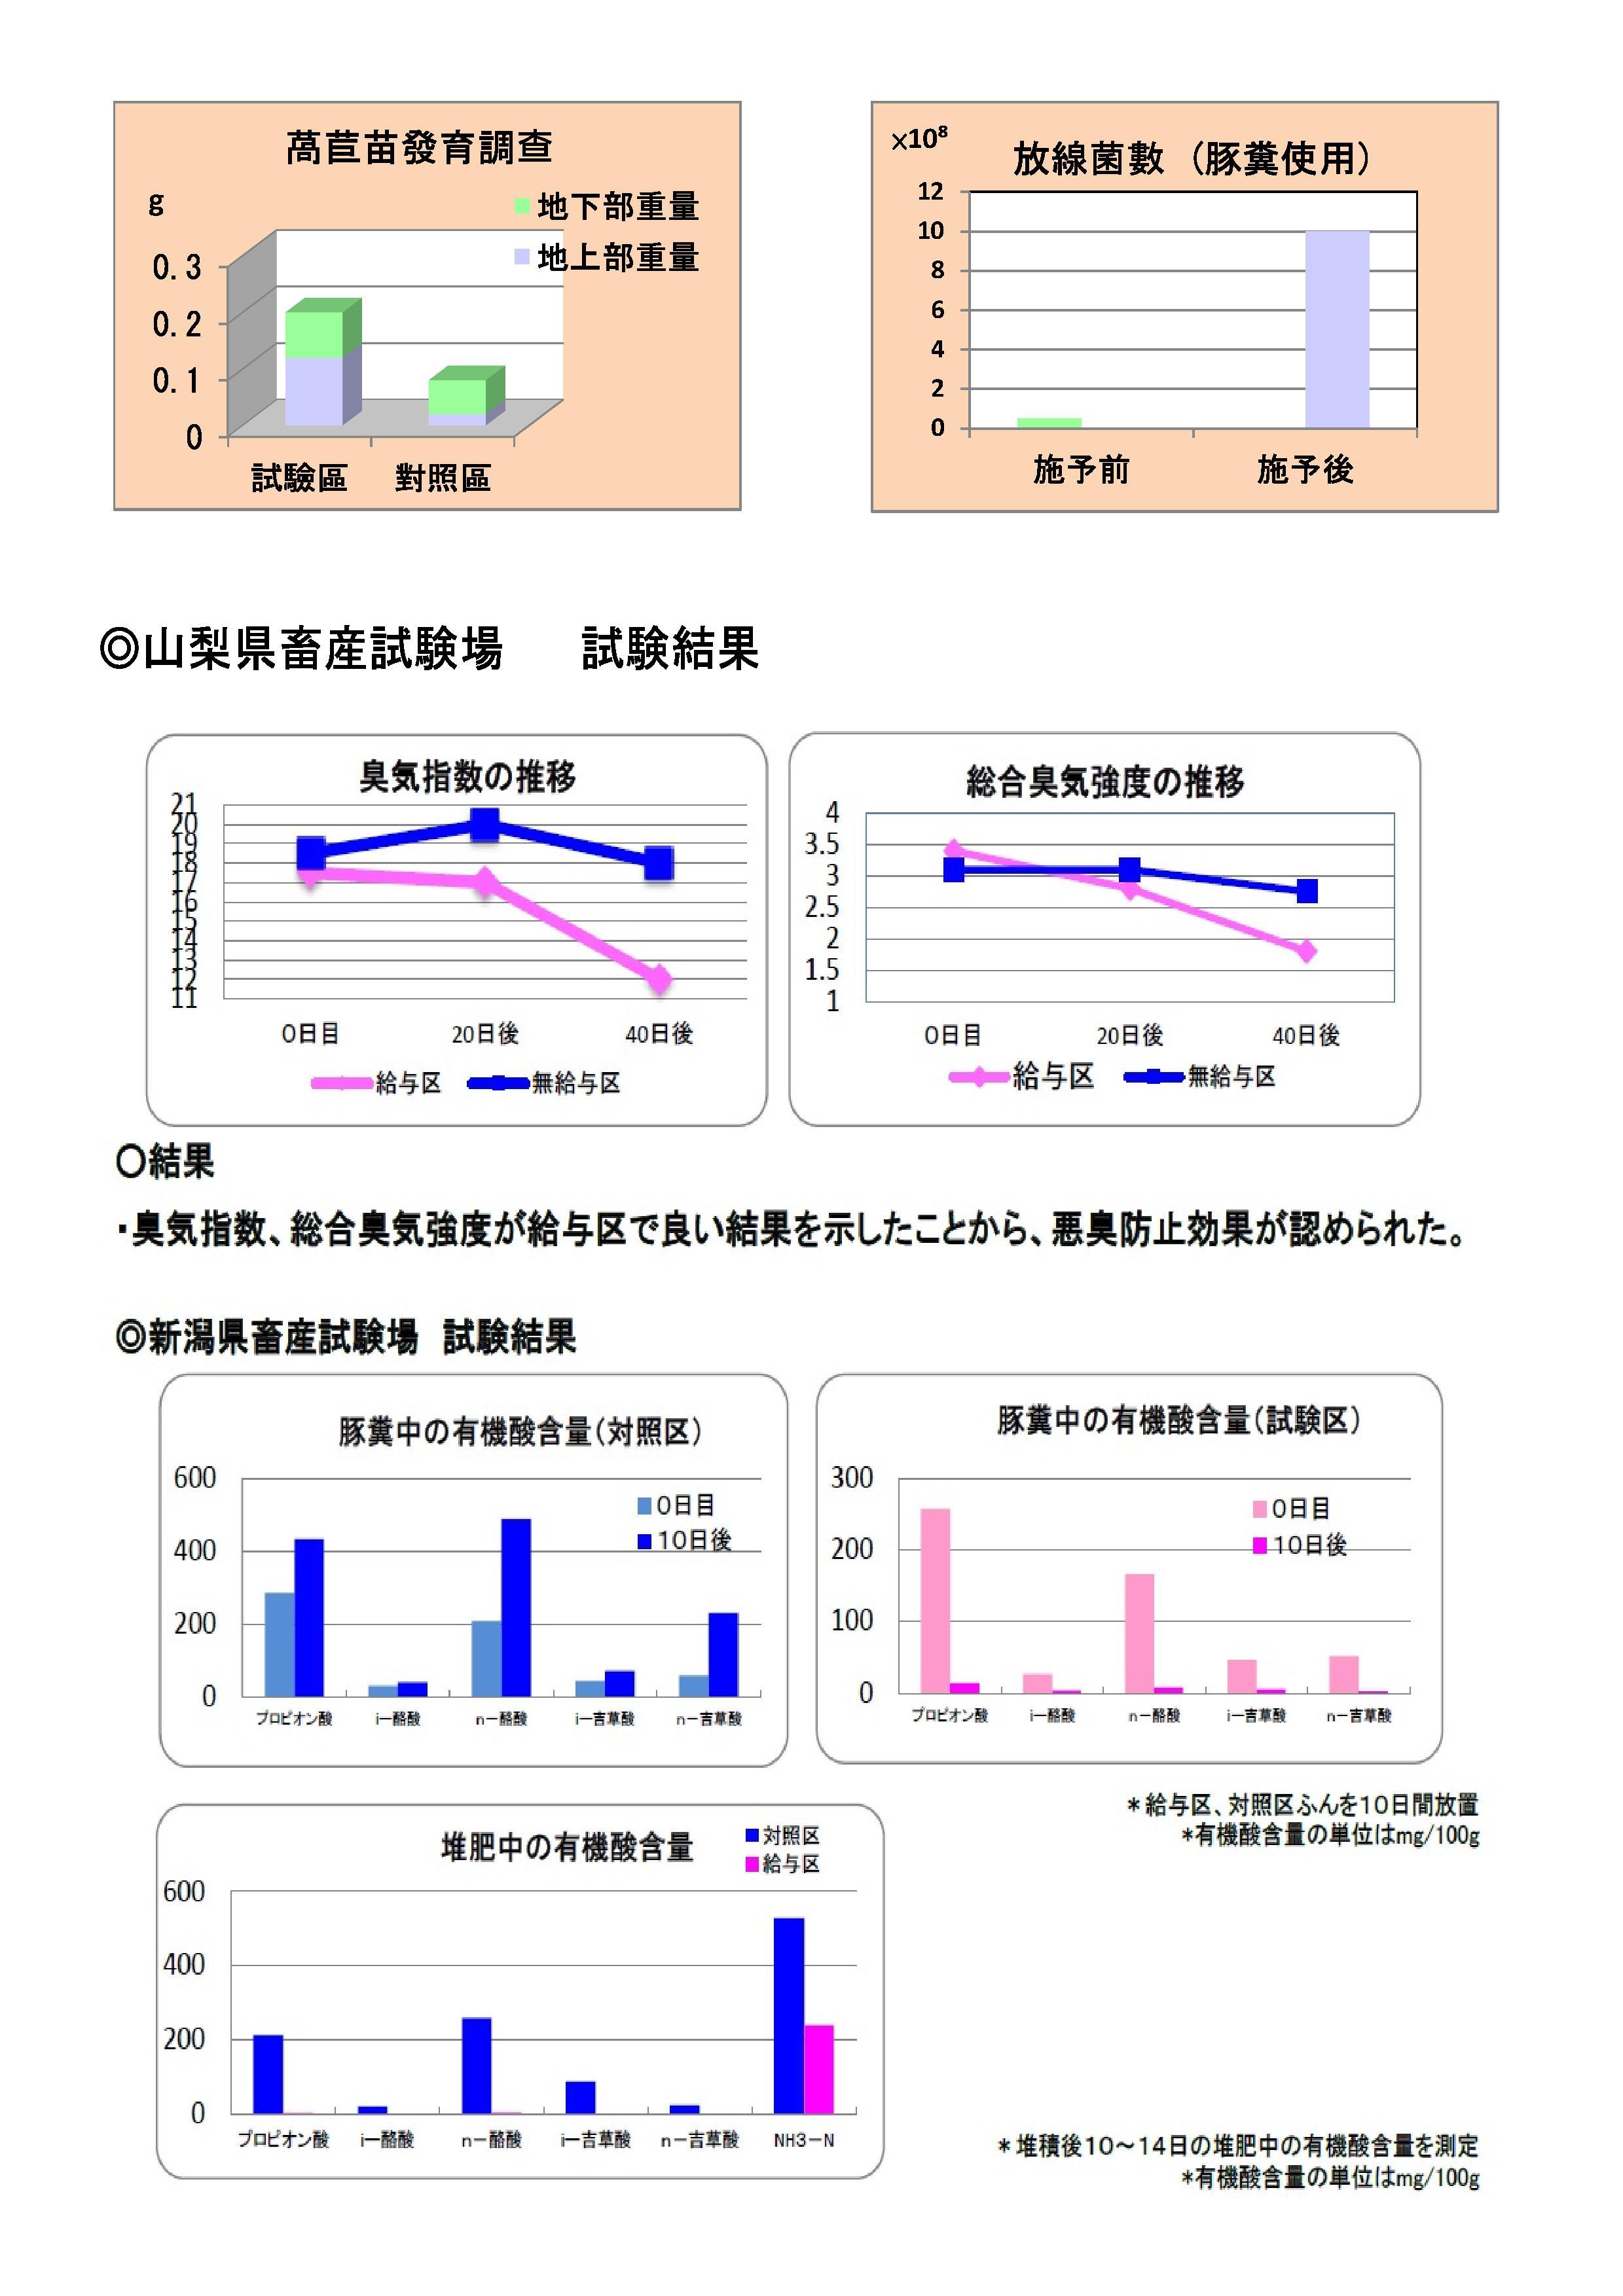 NEO+仔豬DM_20190125 (5)